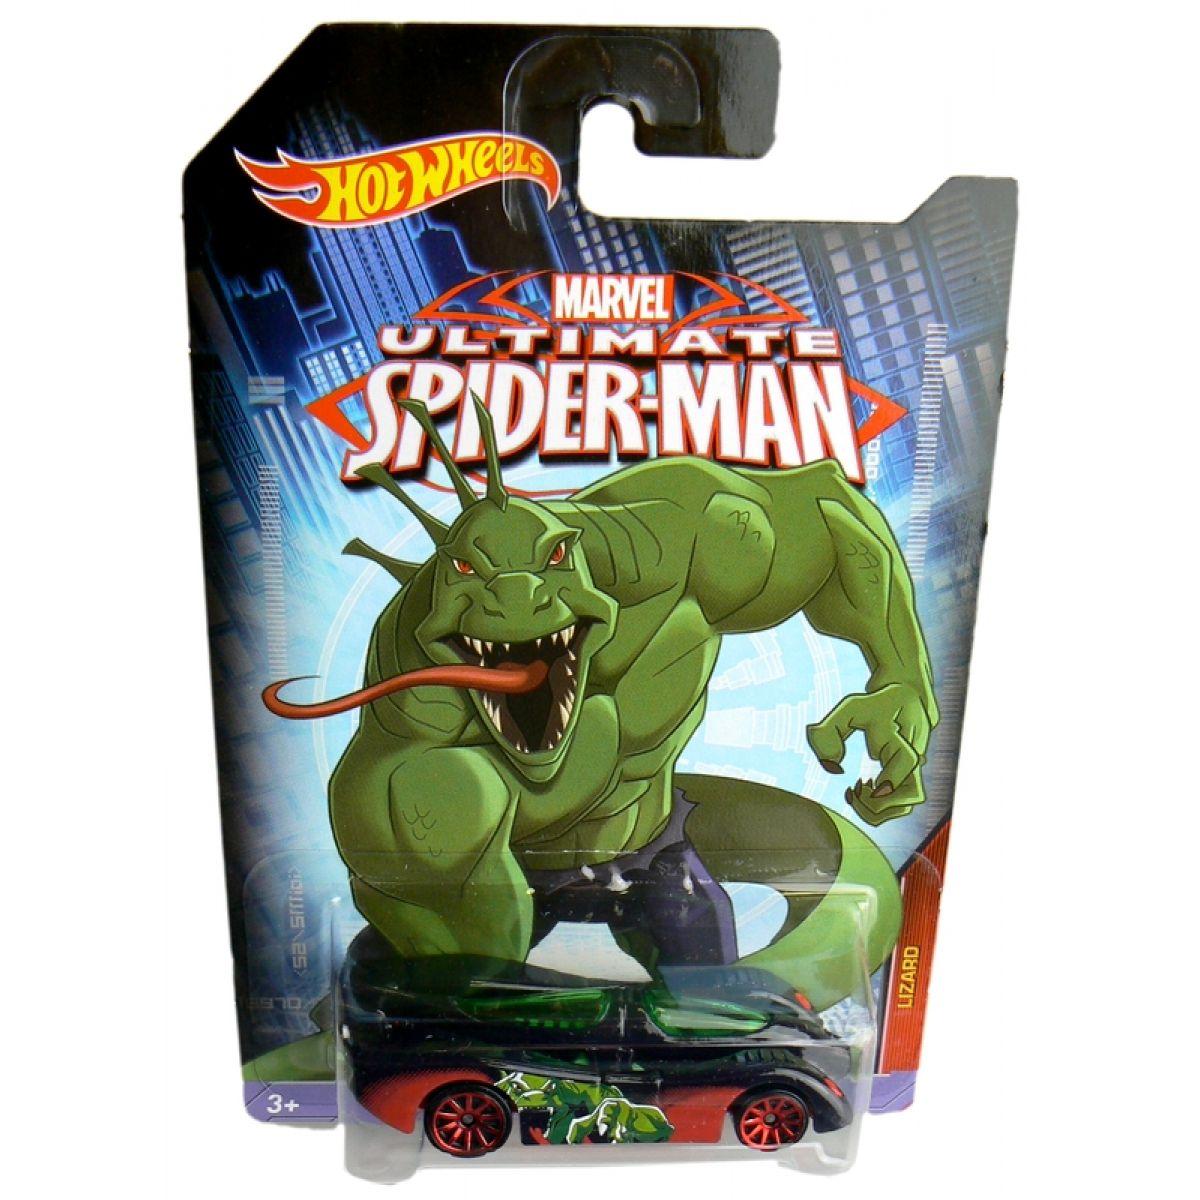 Hot Wheels Spiderman Autíčko - Lizard